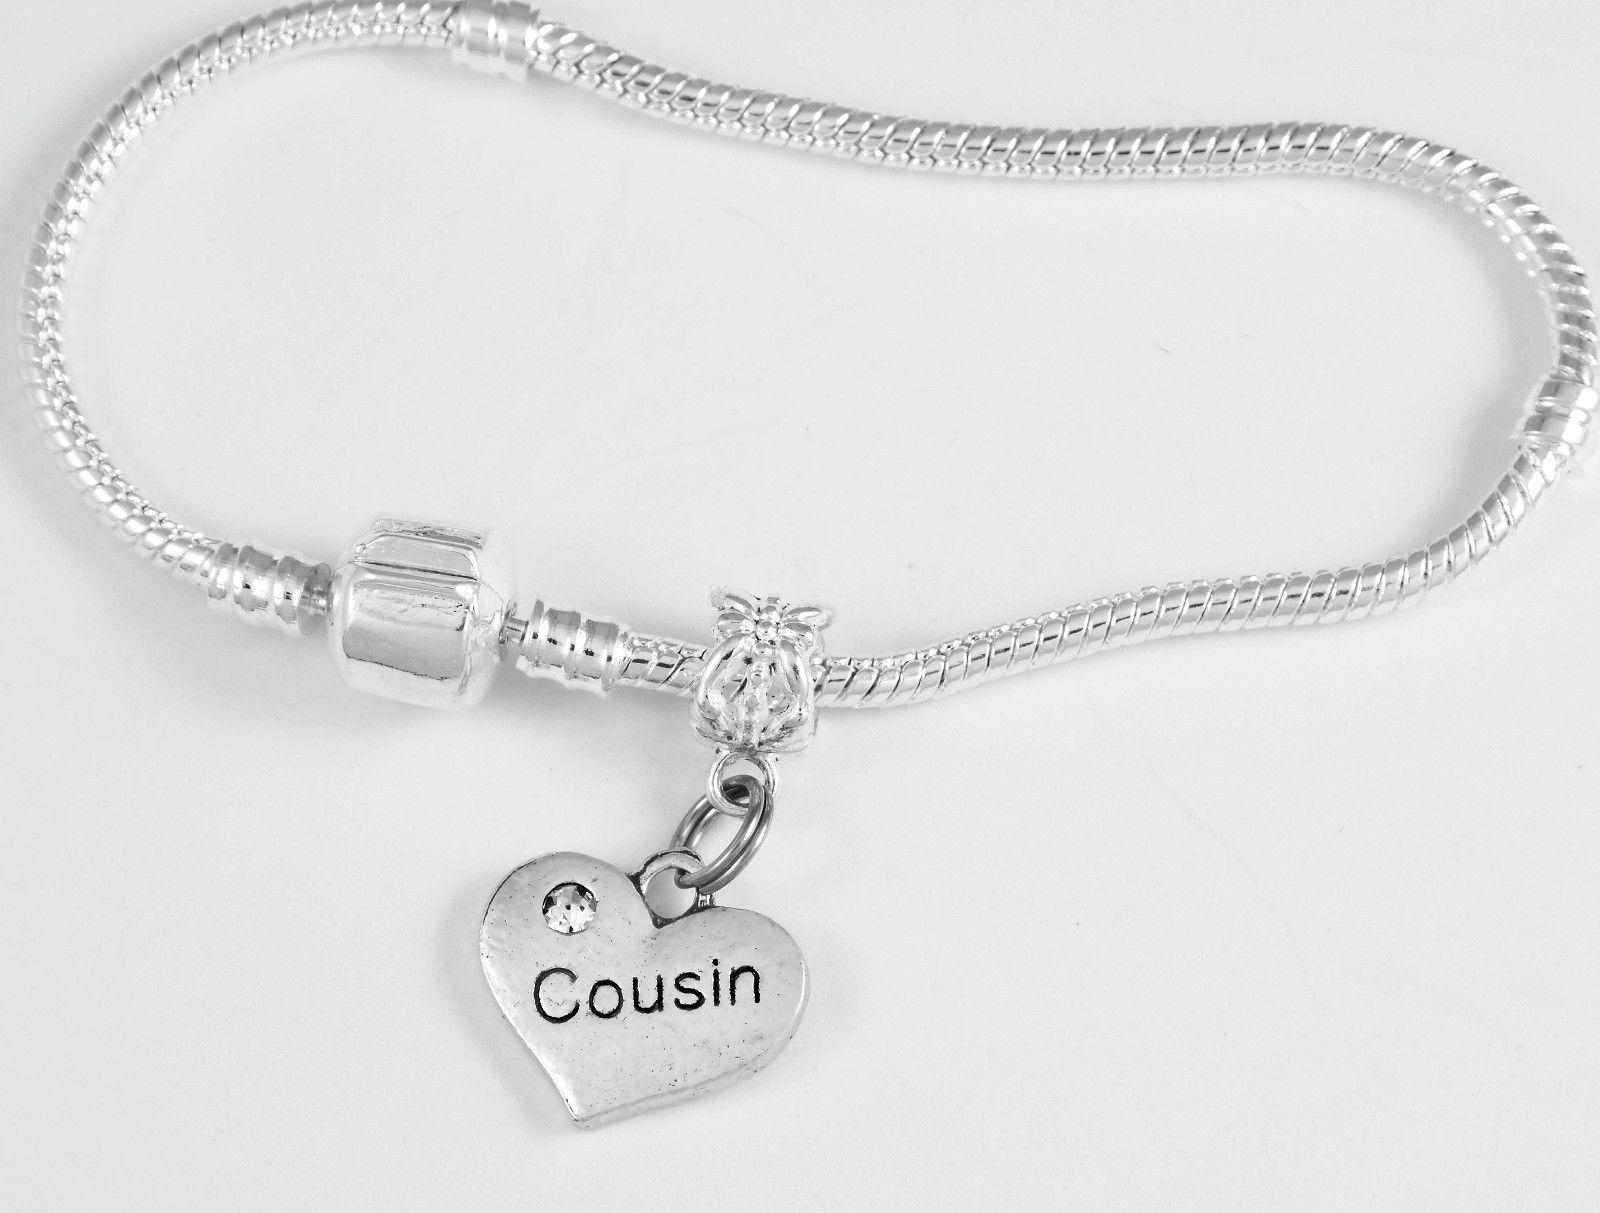 Cousin Bracelet Gift Cousins Jewelry Bangle Charm Best